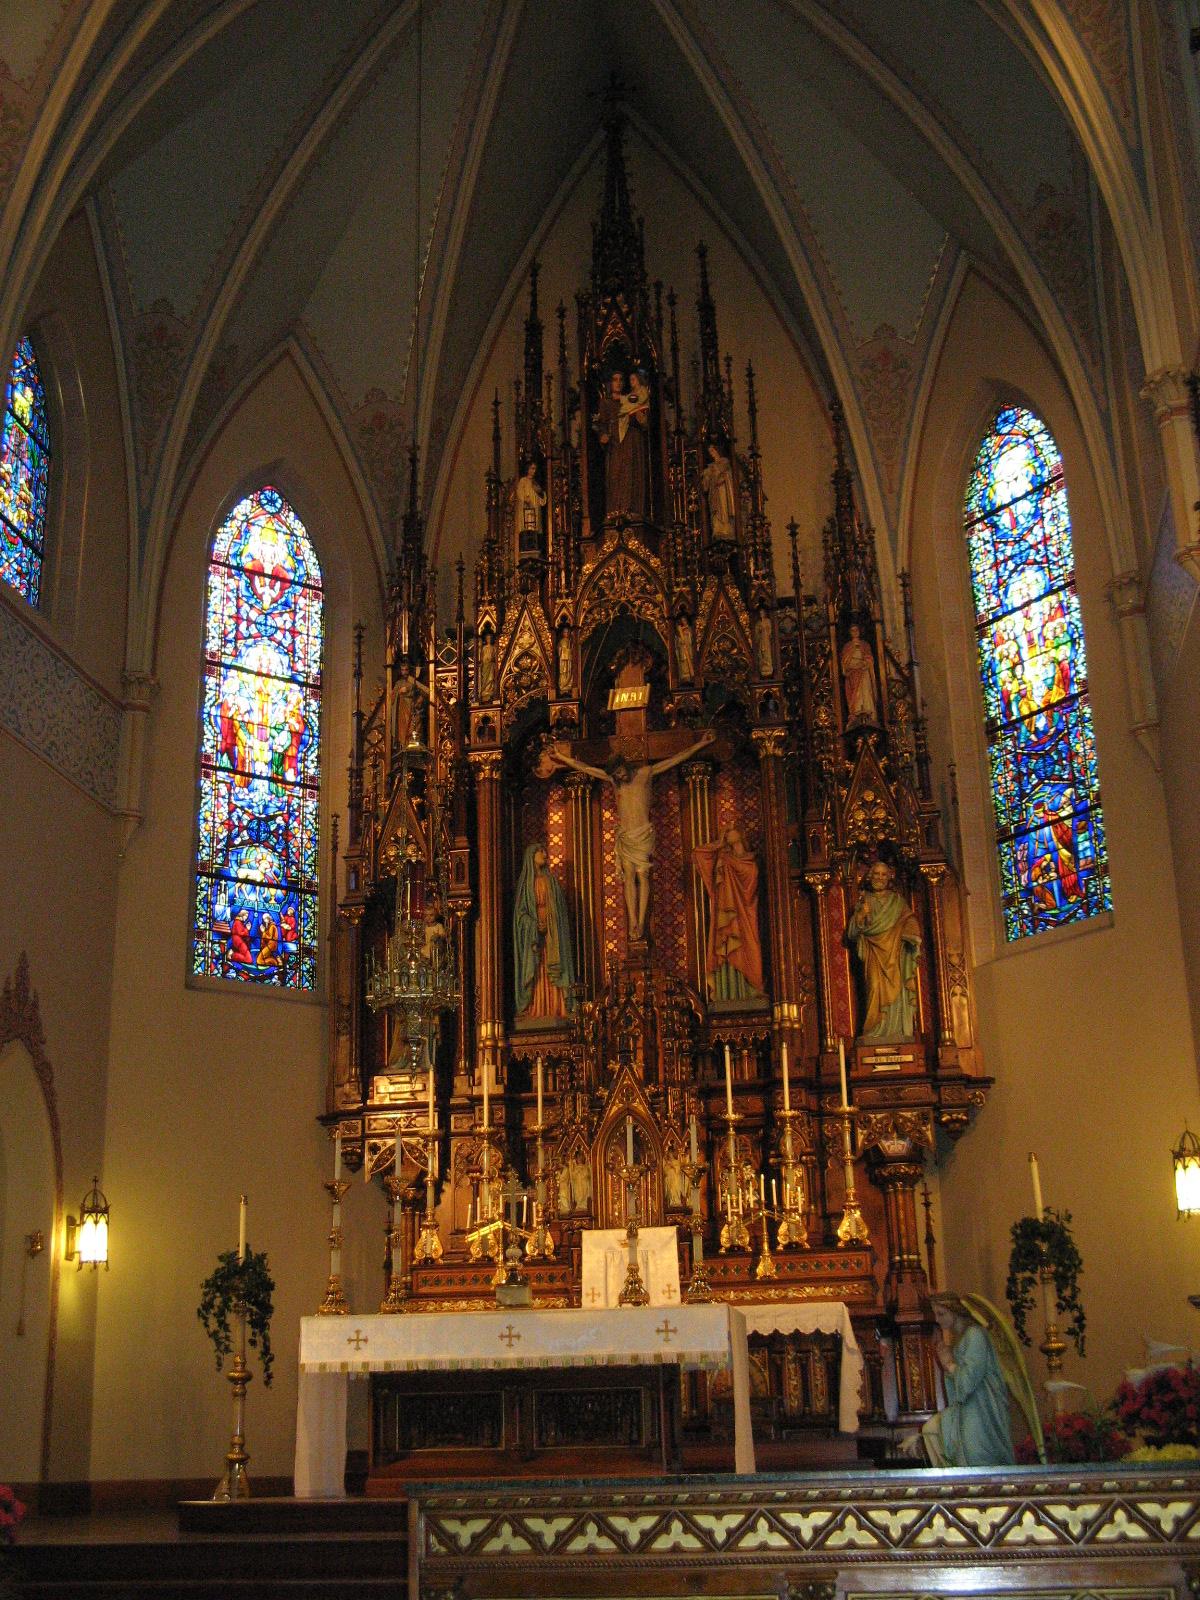 http://4.bp.blogspot.com/-obs3xxiTNEc/UDT1cCxLp4I/AAAAAAAAAE4/tzXCcmnJ980/s1600/St.+Anthony+Catholic.JPG